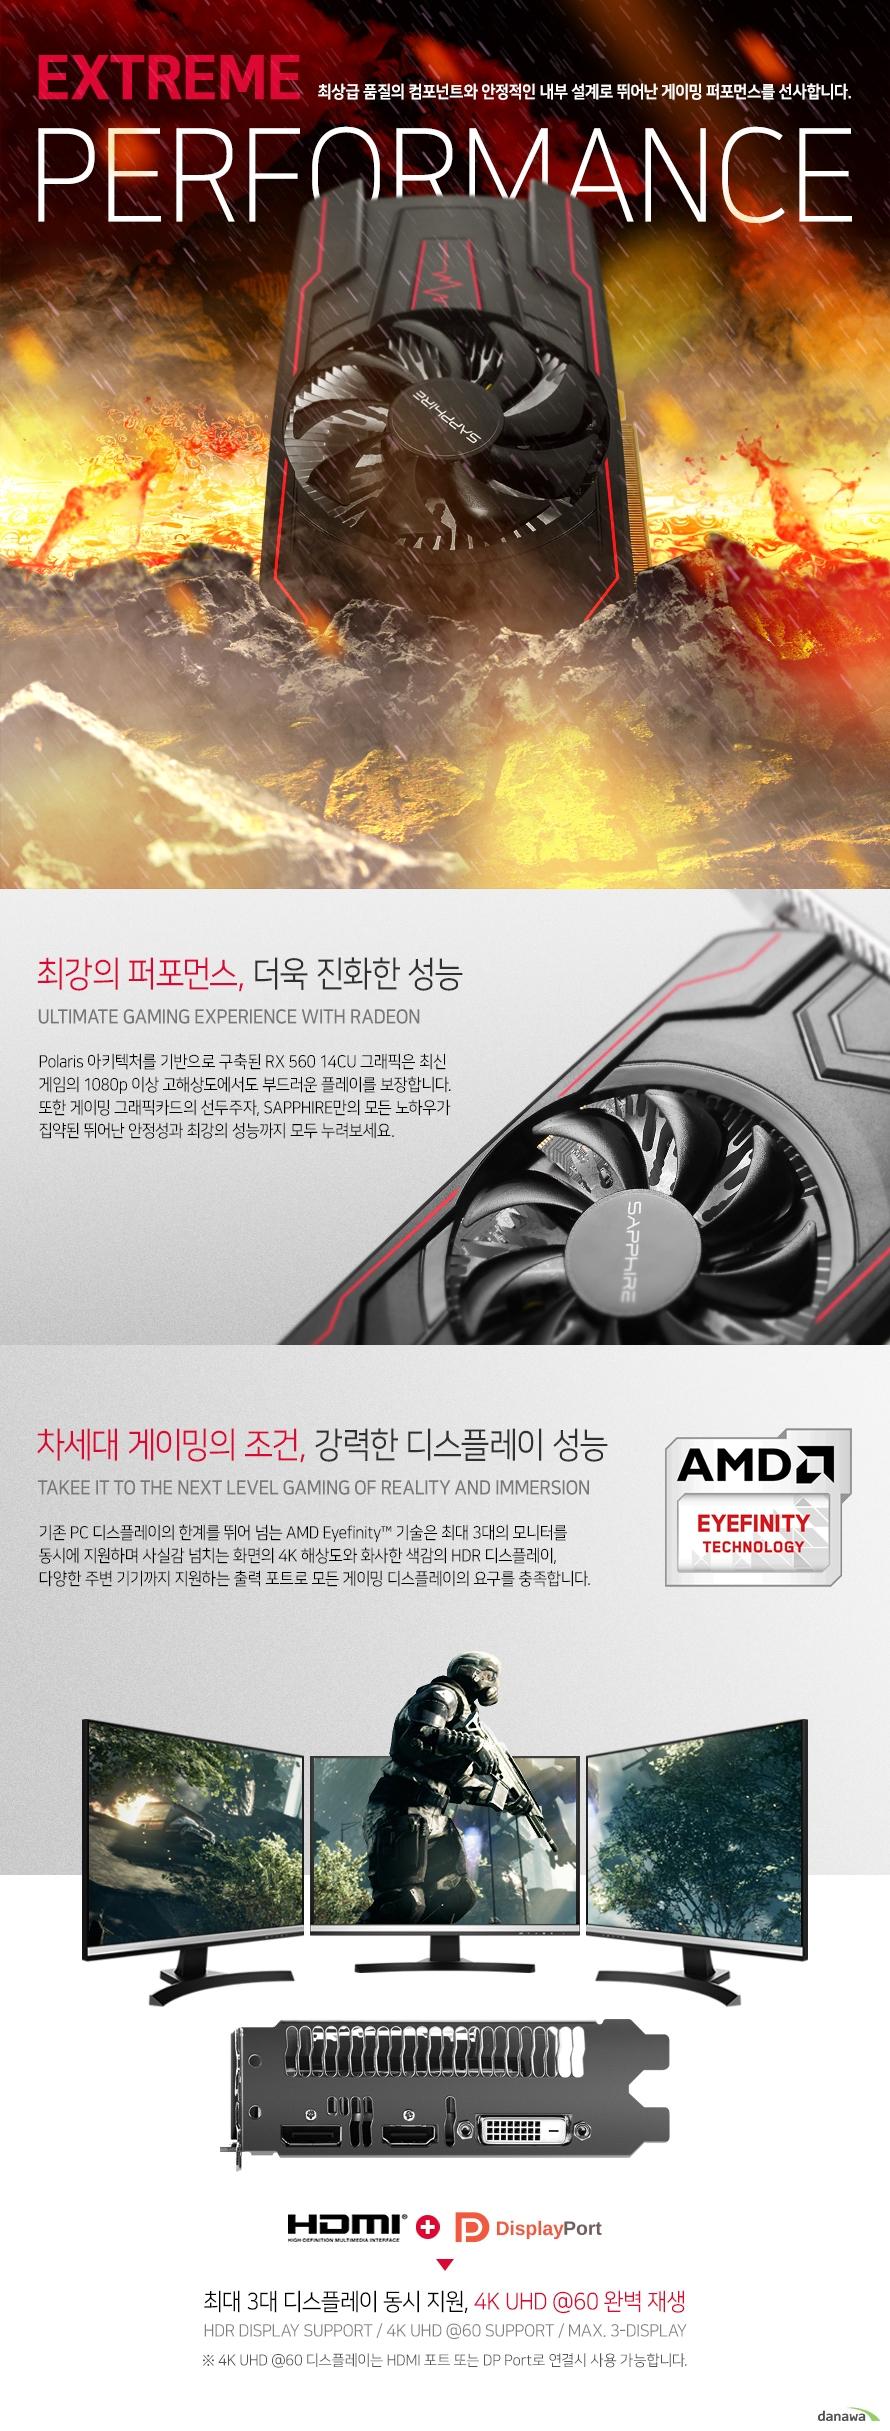 Polaris 아키텍처를 기반으로 구축된 RX 580 그래픽은 최신 고사양 게임의 1080p 이상 고해상도에서도 부드러운 플레이를 보장합니다. 또한 게이밍 그래픽카드의 선두주자, SAPPHIRE만의 모든 노하우가 집약된 뛰어난 안정성과 최강의 성능까지 모두 누려보세요. 기존 PC 디스플레이의 한계를 뛰어 넘는 AMD Eyefinity 기술은 최대 5대의 모니터를 동시에 지원하며 사실감 넘치는 화면의 4K 해상도와 화사한 색감의 HDR 디스플레이, 최신 VR 기기까지 지원하는 출력 포트로 모든 게이밍 디스플레이의 요구를 충족합니다